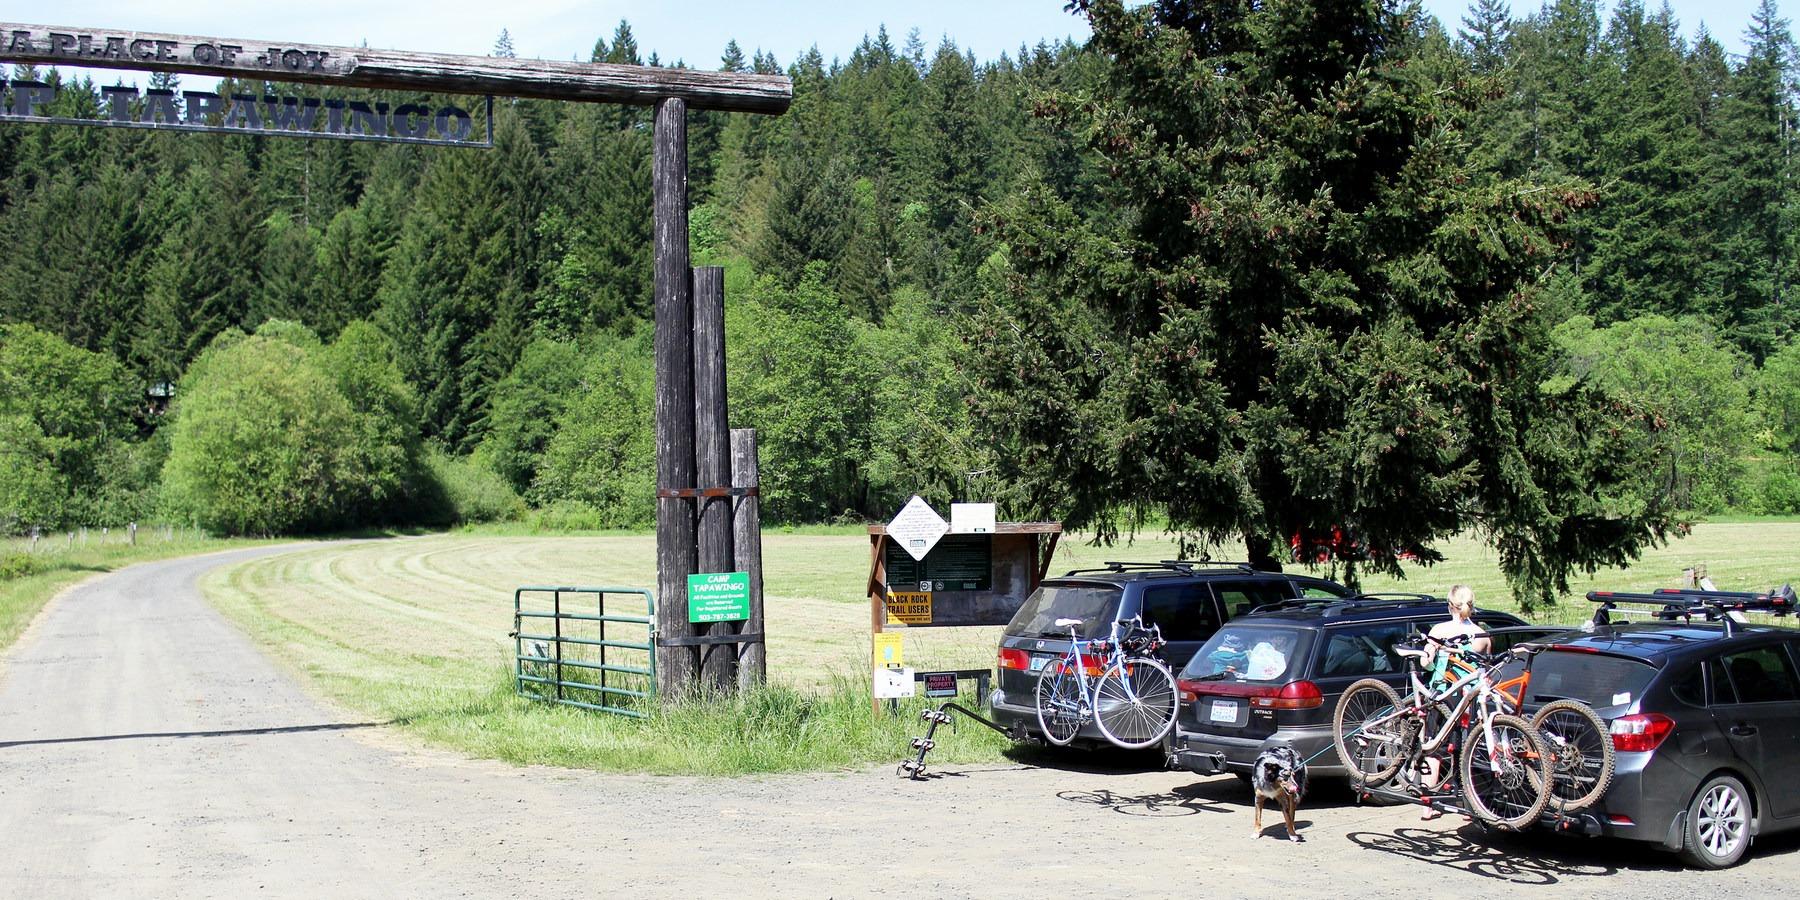 Black Rock Mountain Bike Area Outdoor Project